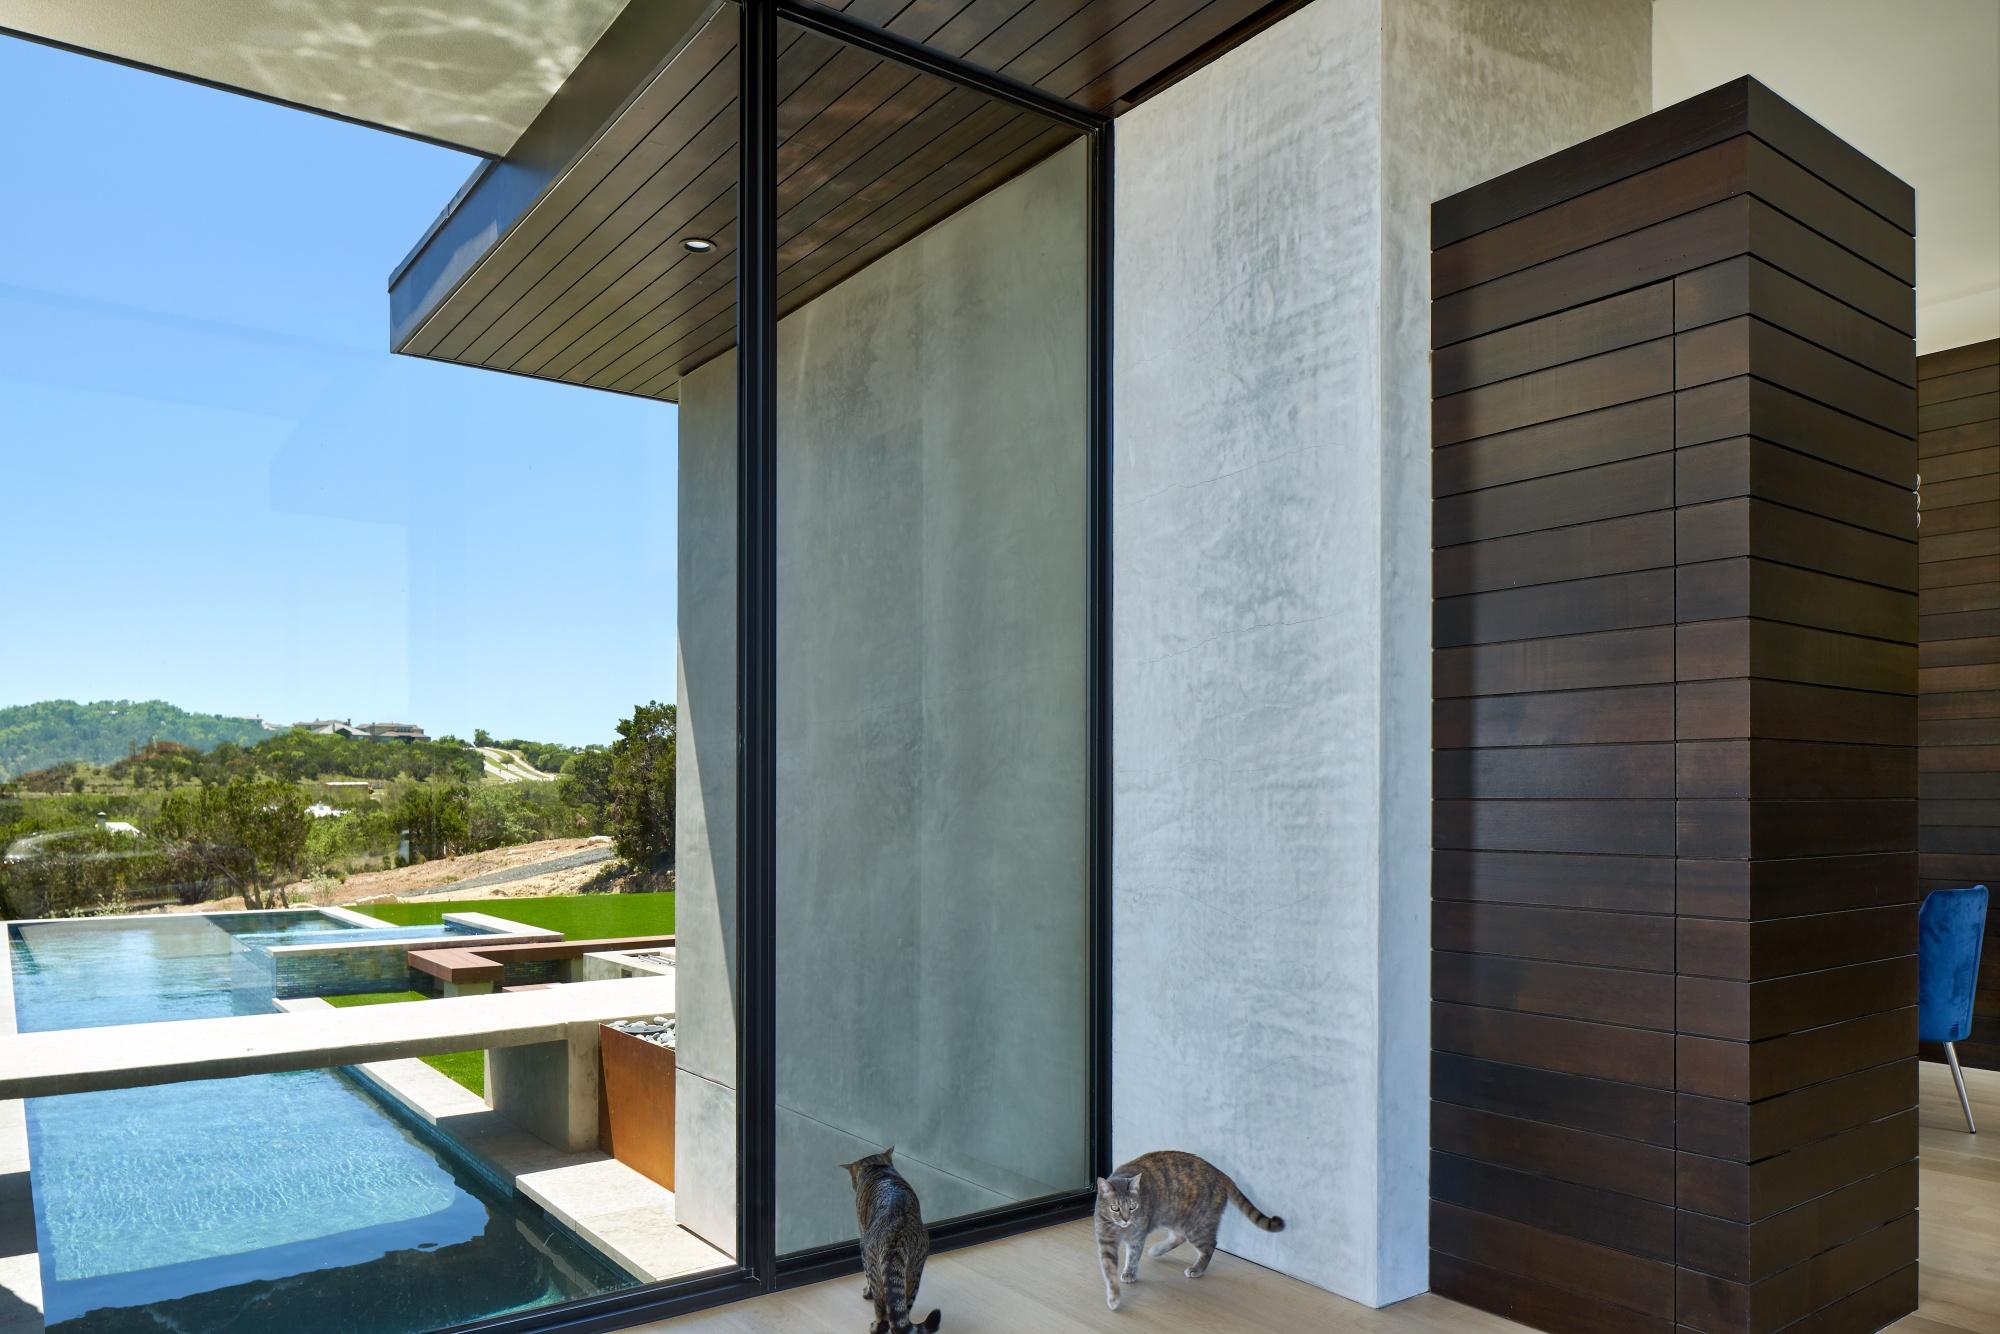 Lap pool, bridge and glass create interesting shadows.